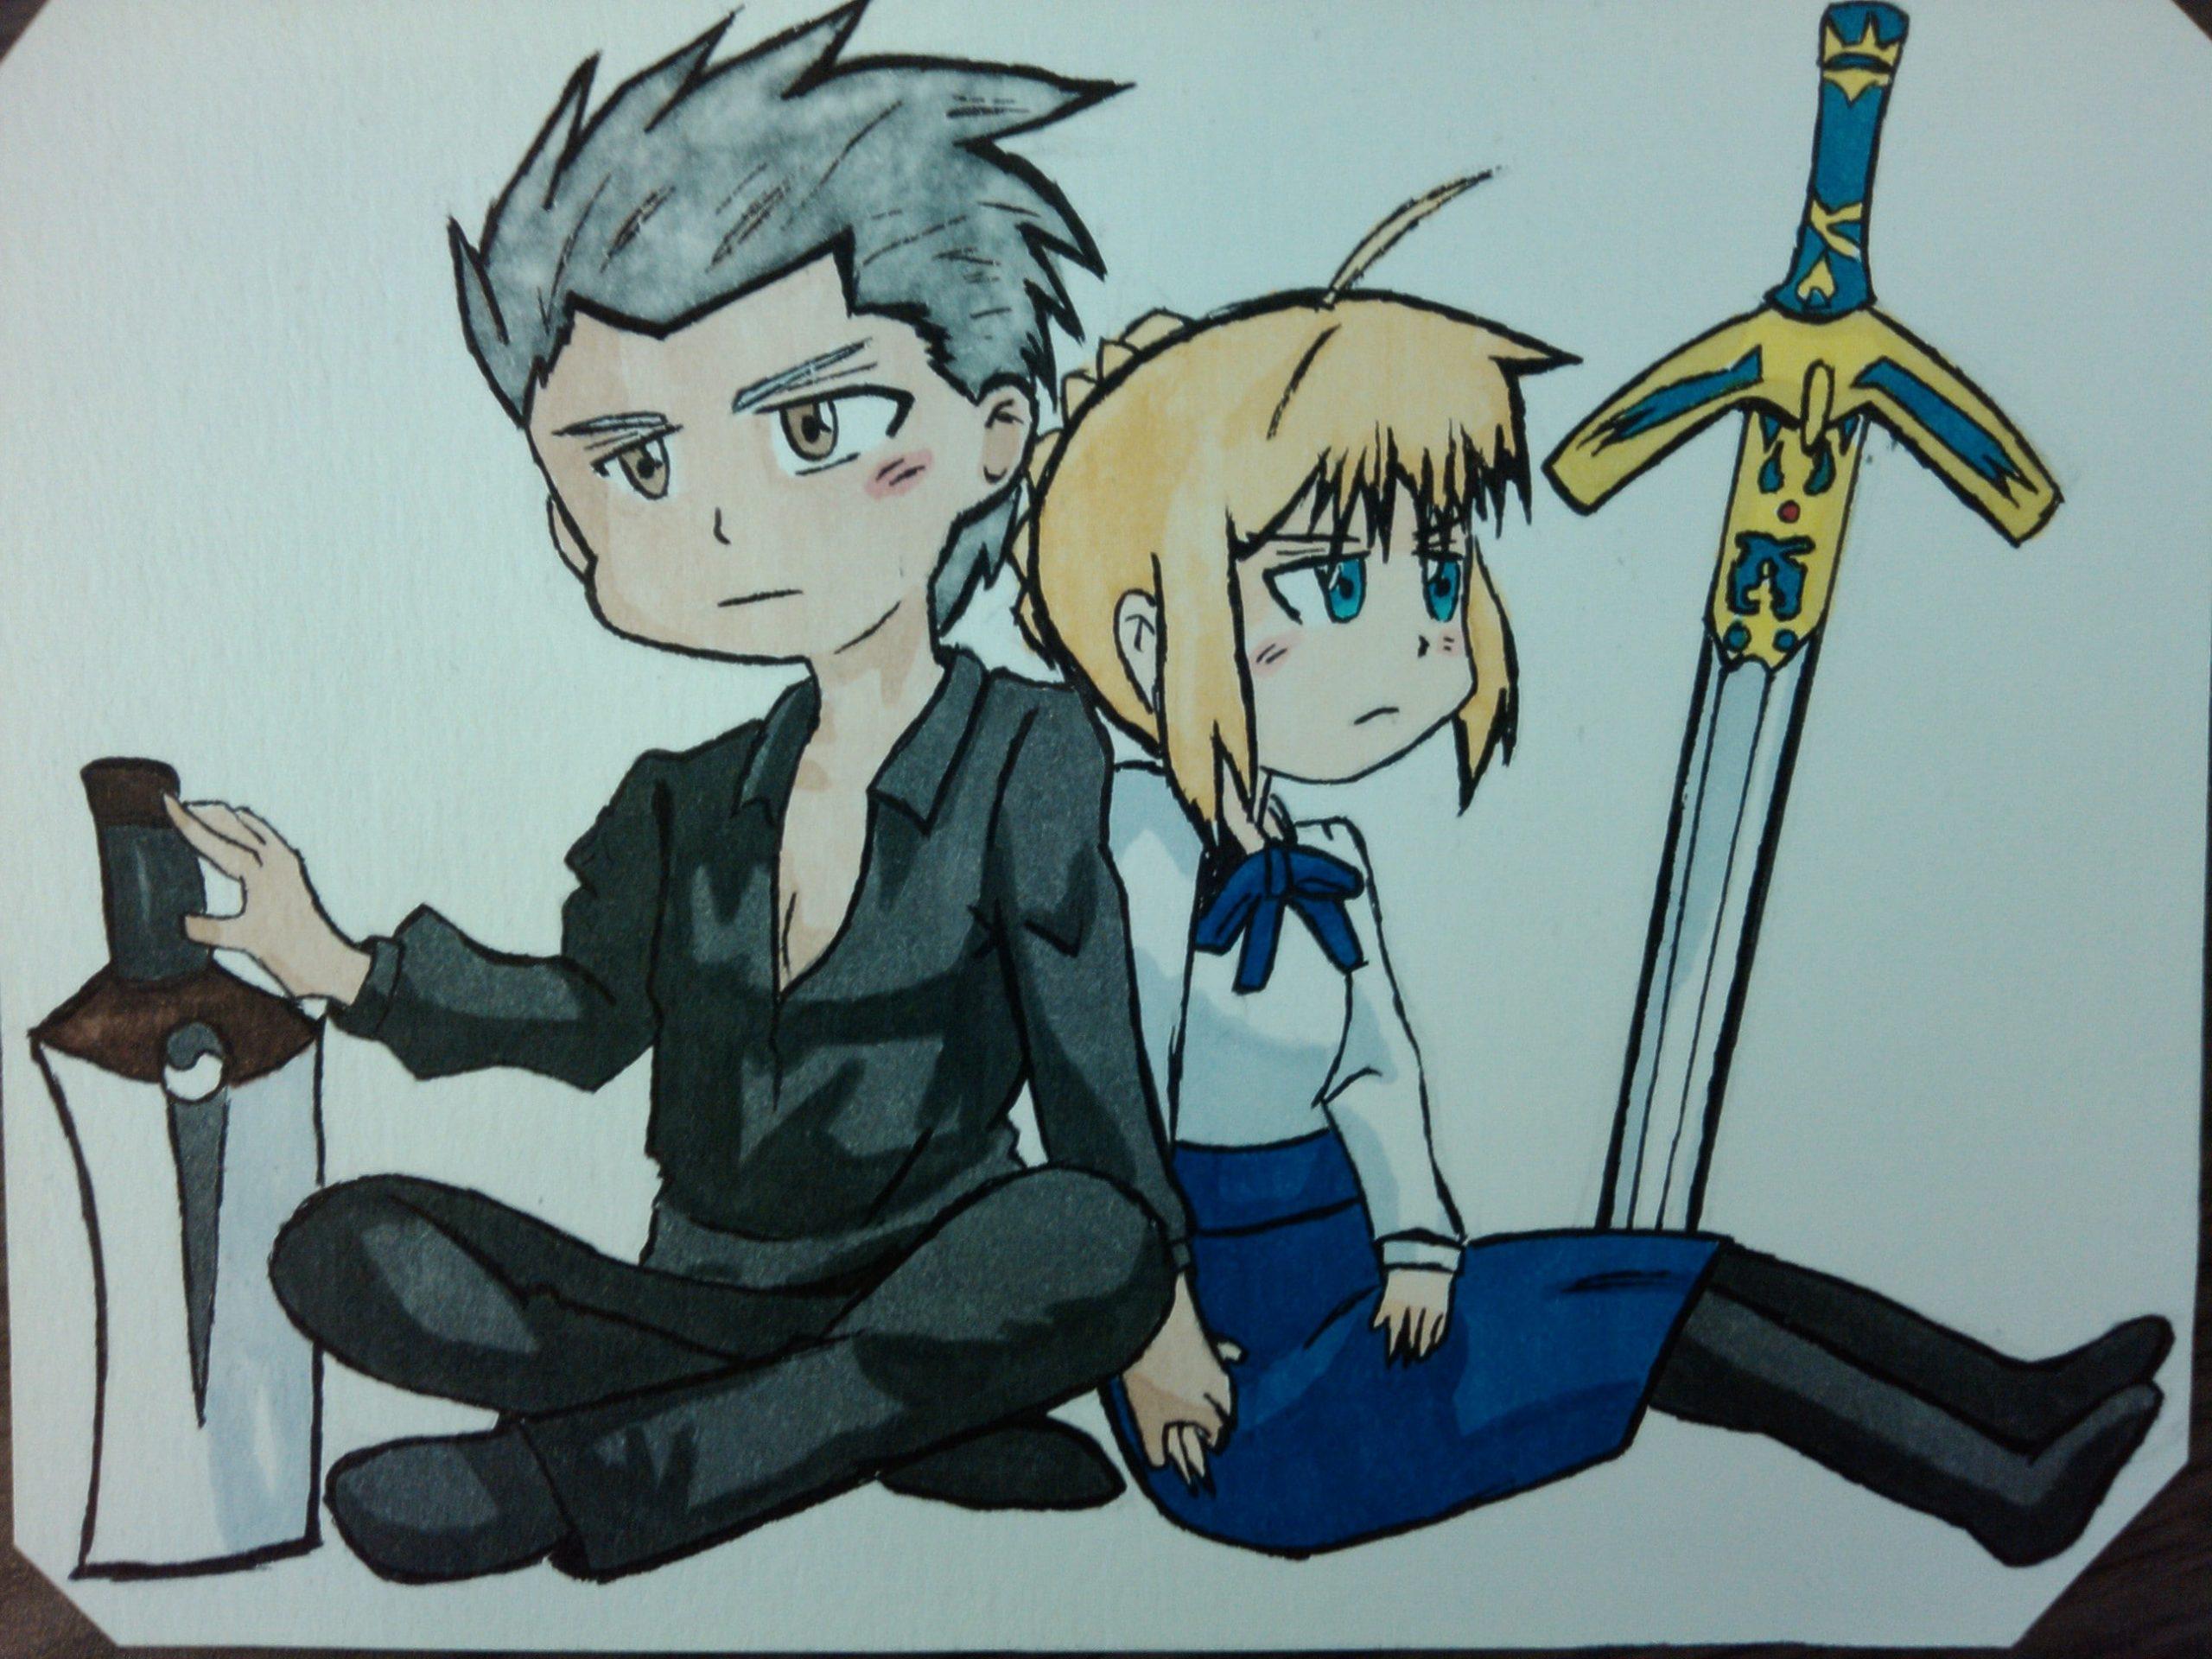 Saber & Archer